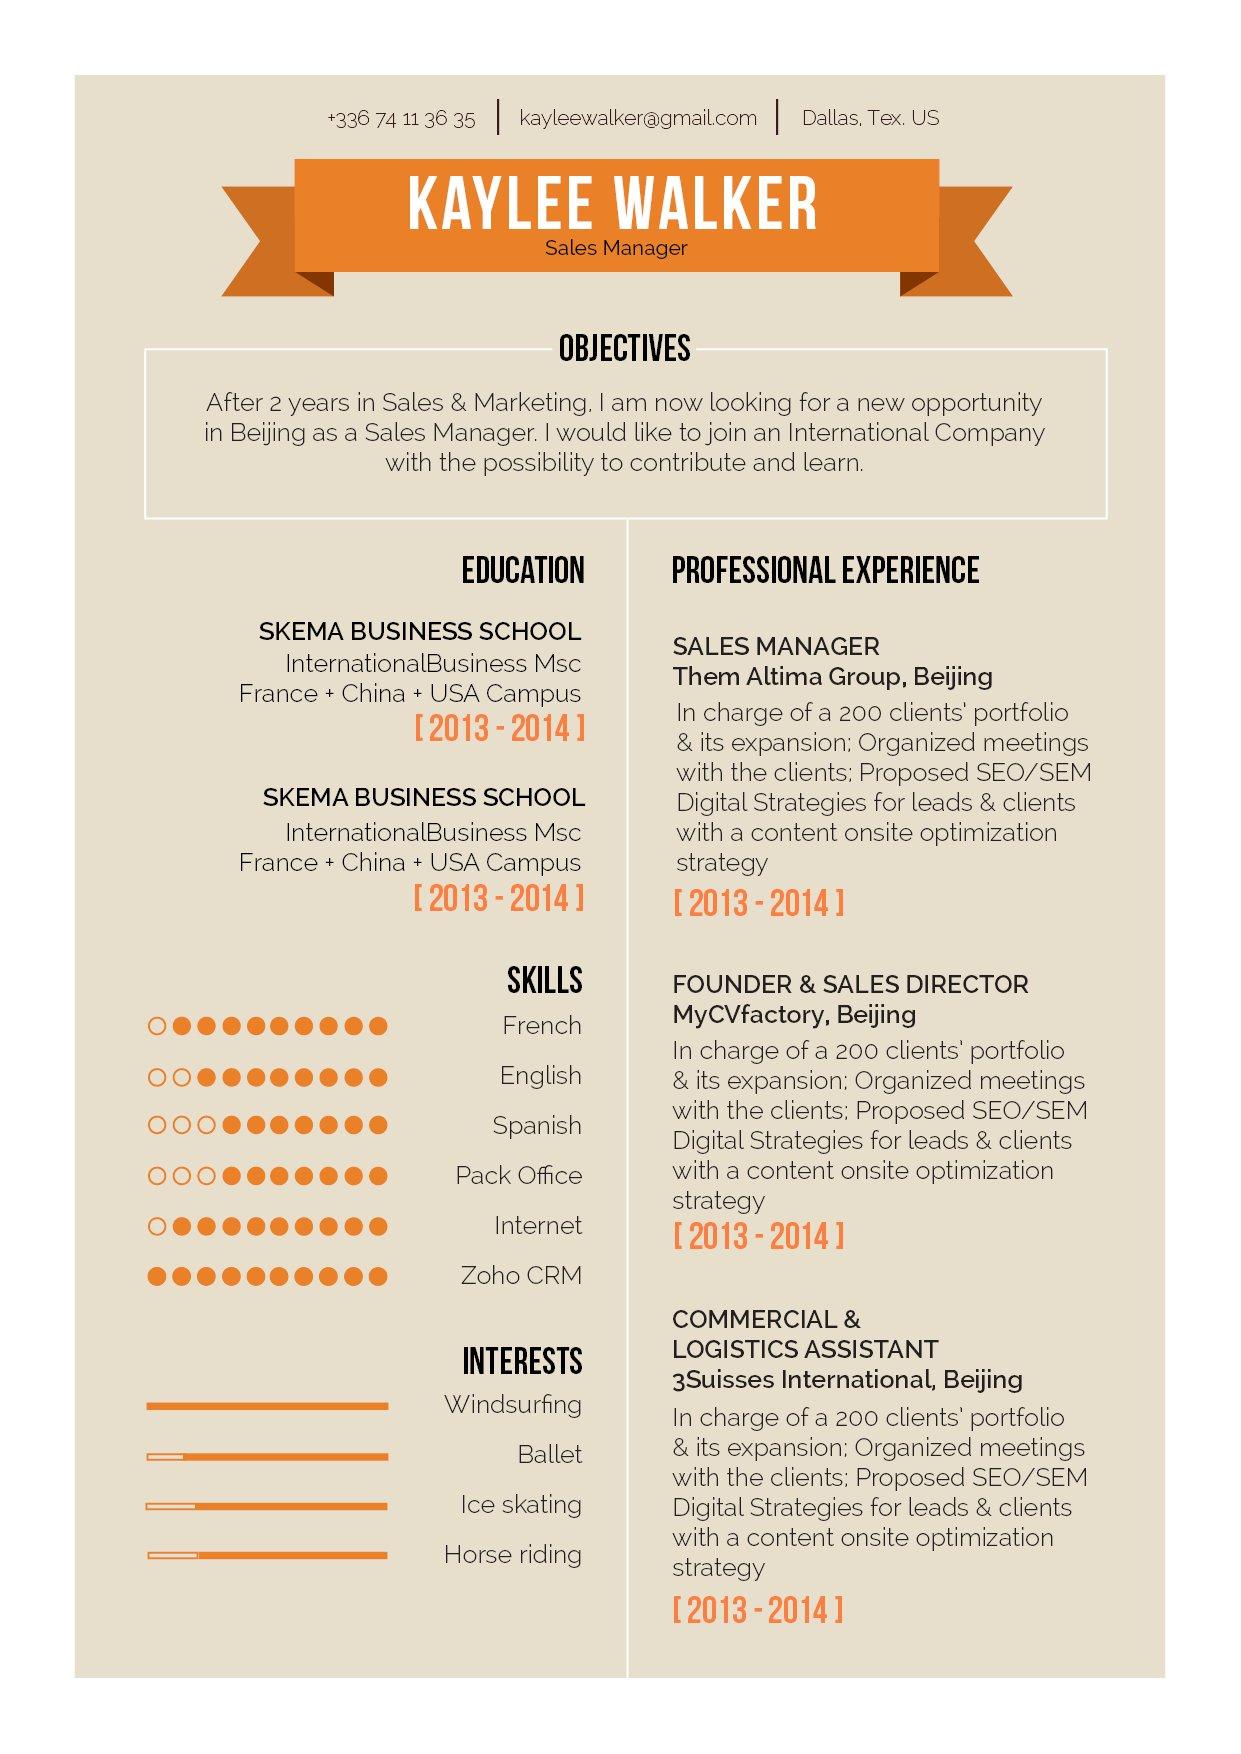 free-resume-mycvfactory-inspiration-0_rzbVdRj.jpg